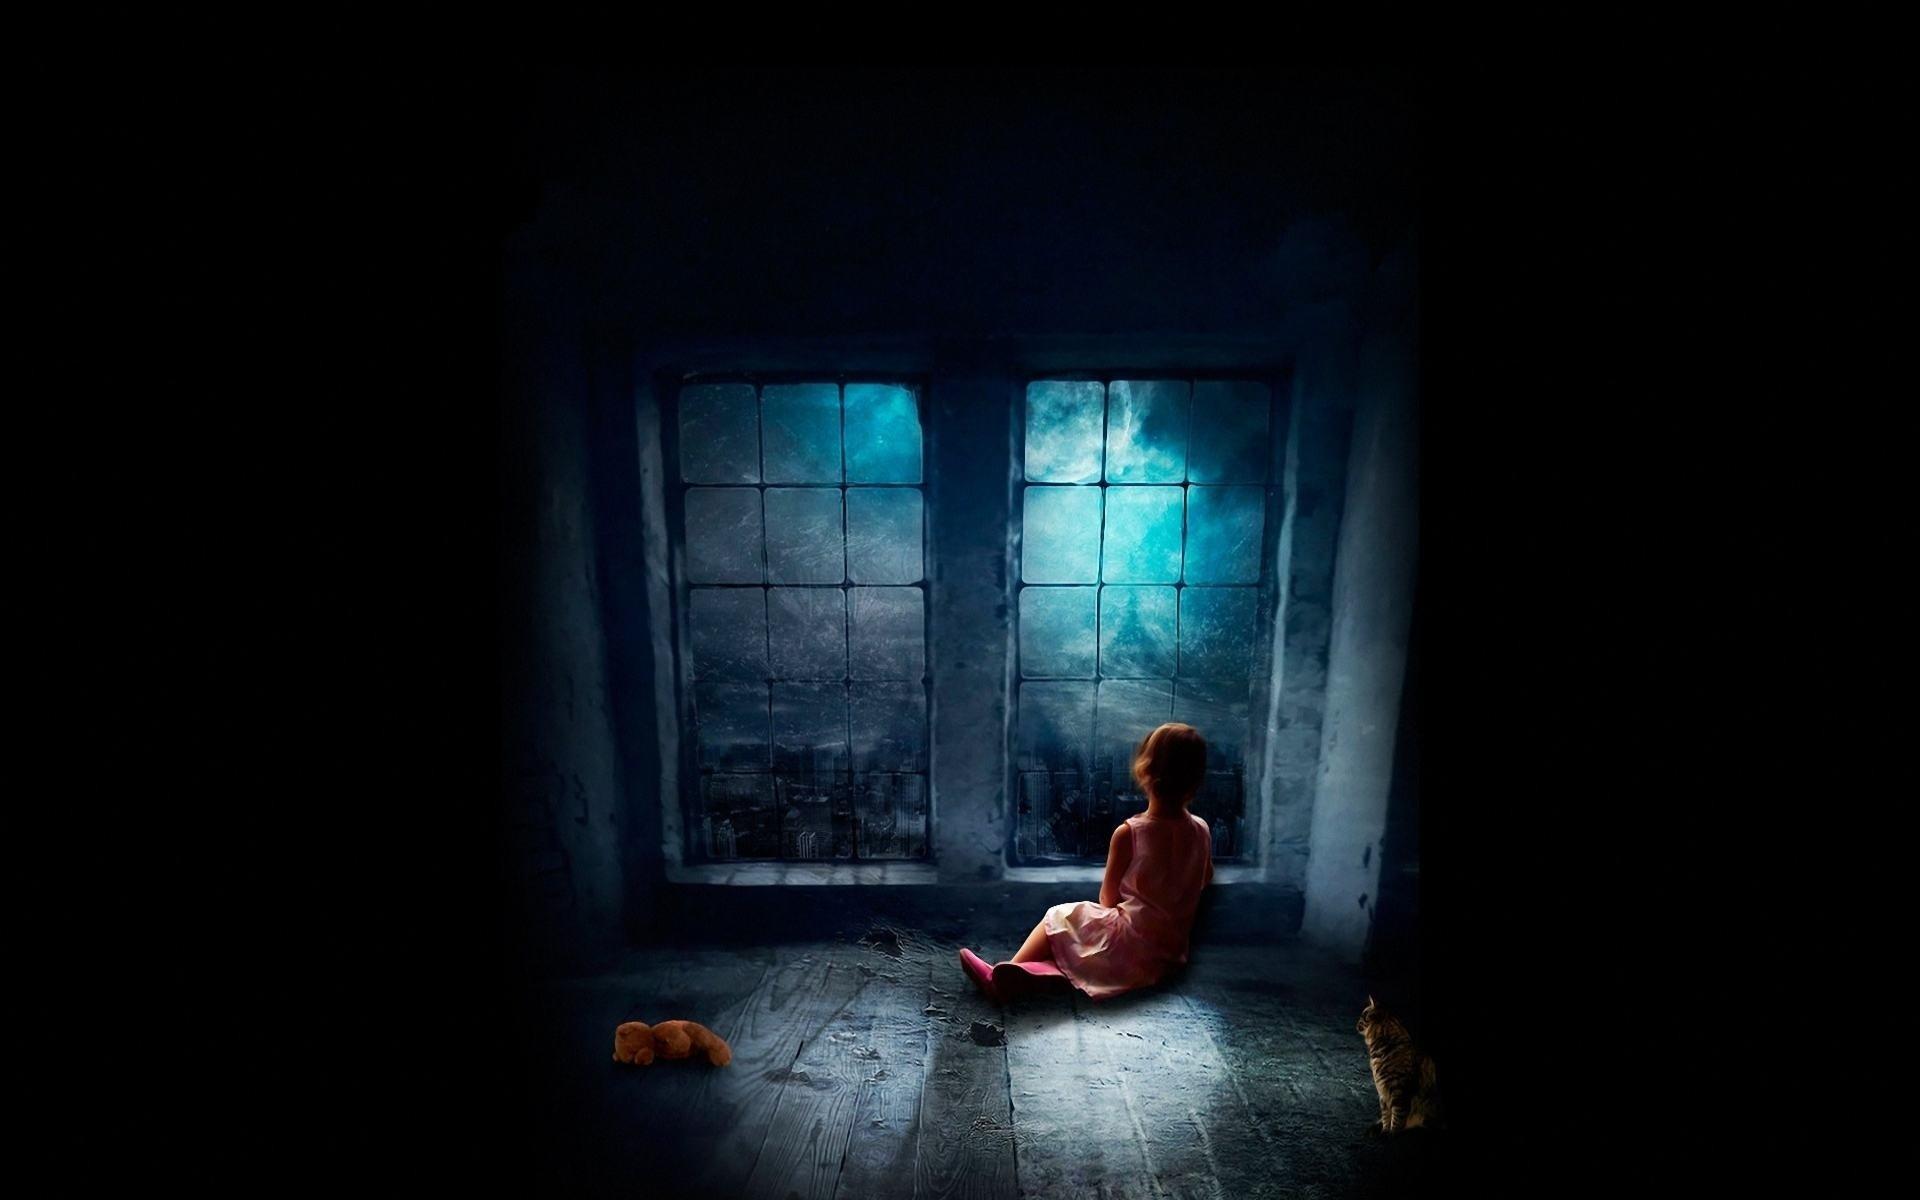 Loneliness dark room france paris mood sad fantasy for Black room wallpaper